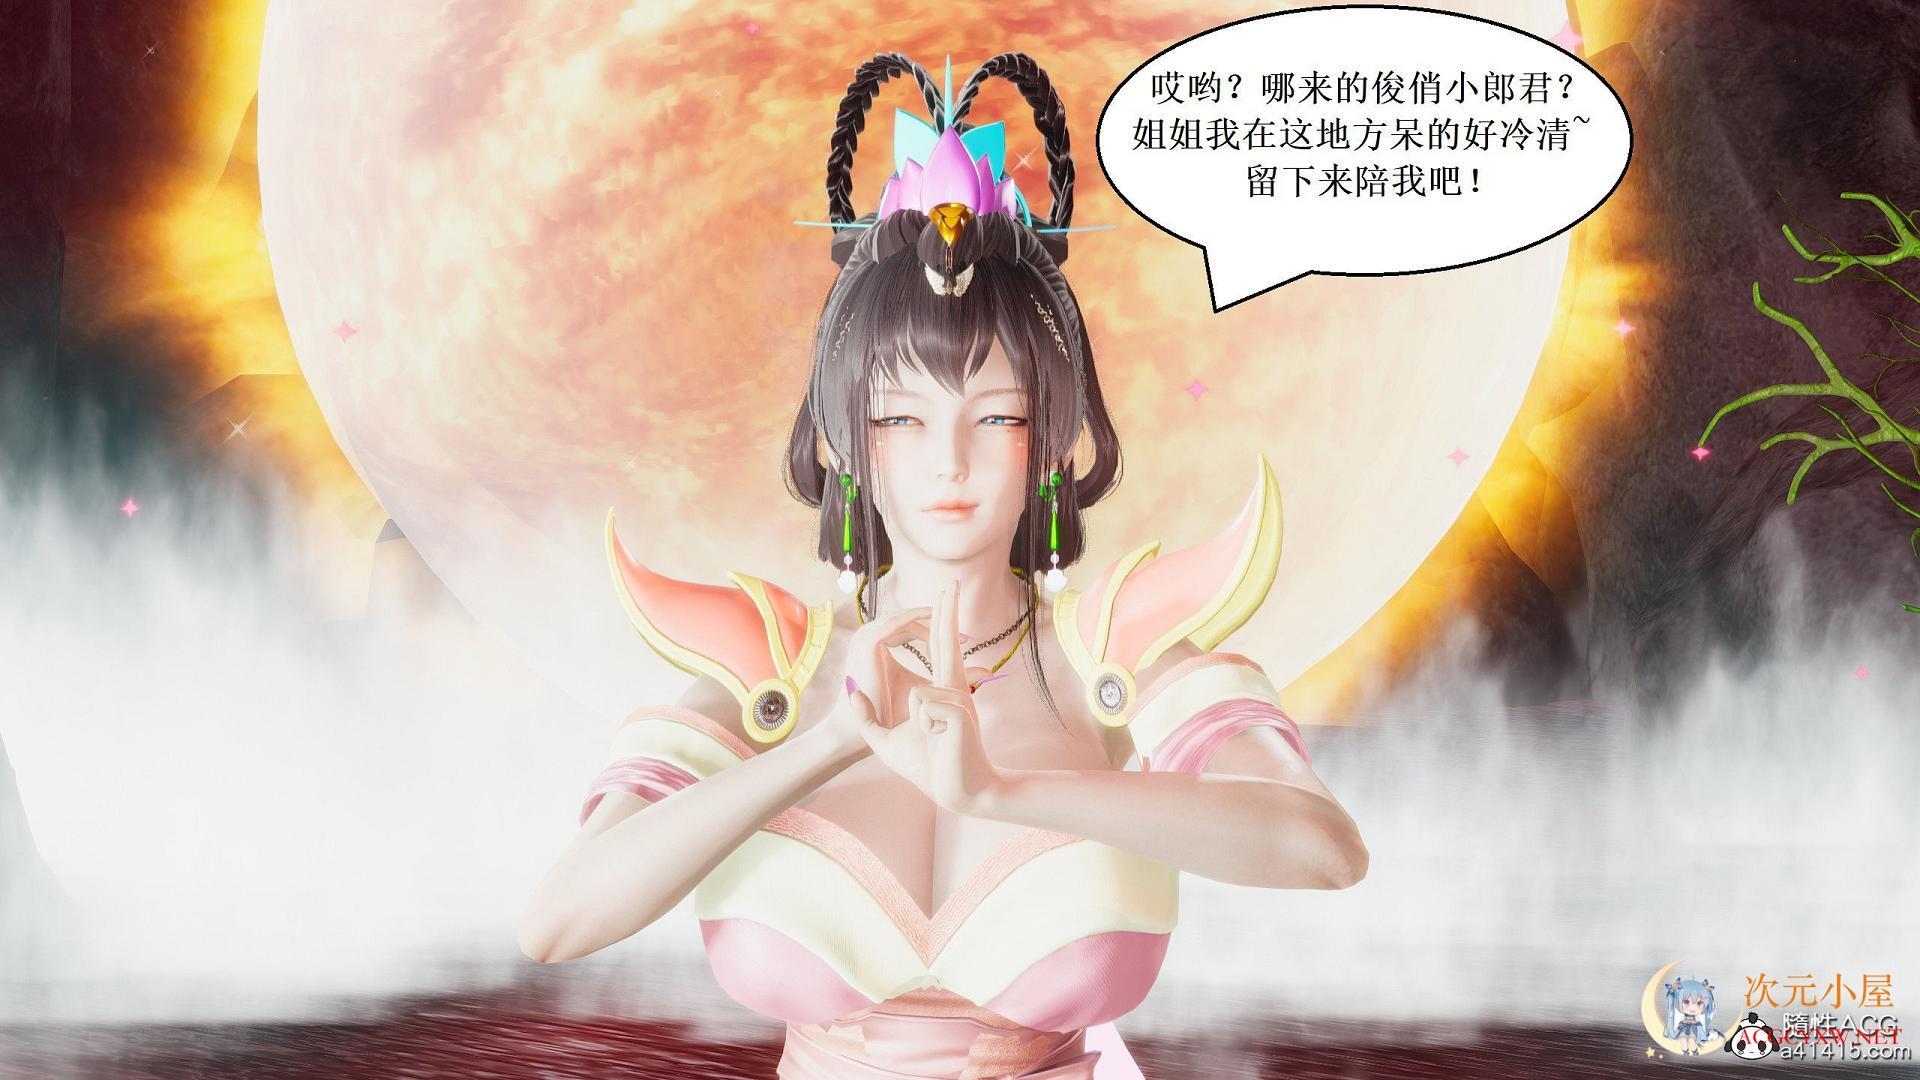 [3D全彩/无修]魔法少女葫芦妹 01-09★玄幻大作 [堕落RBQ/姐妹花][652M]  321 次元小屋